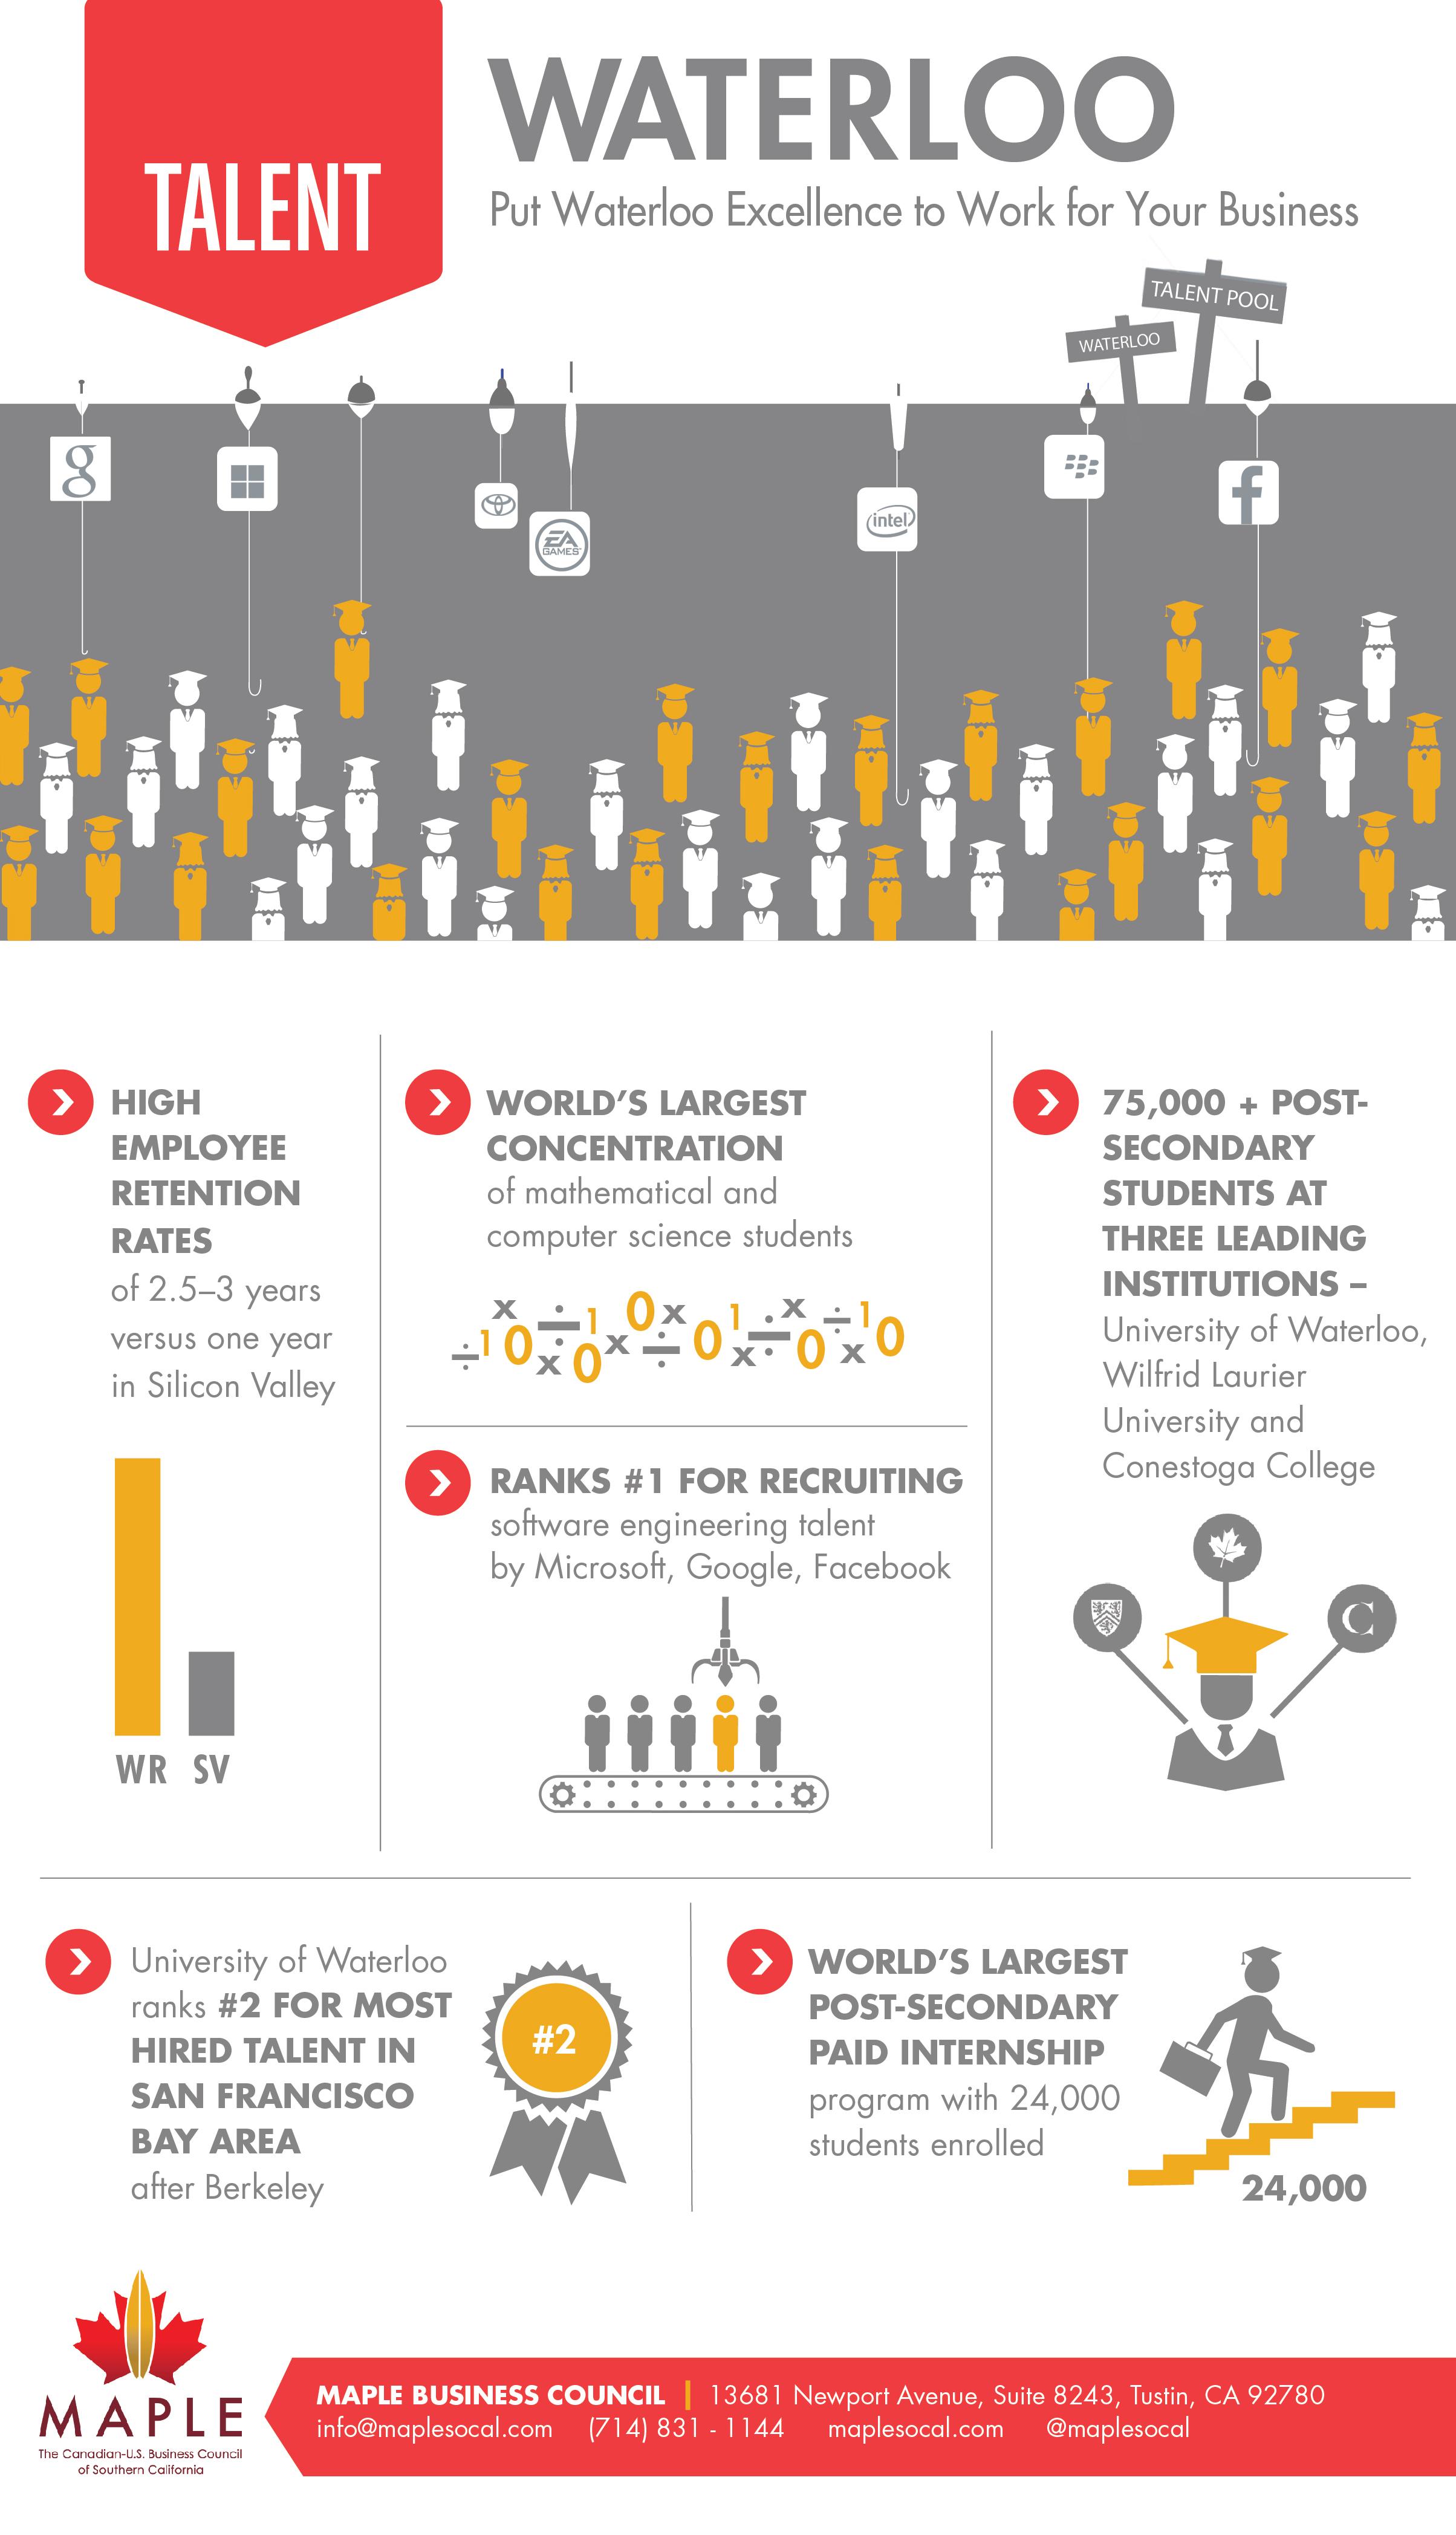 Waterloo_Infographic_Talent_Final.jpg